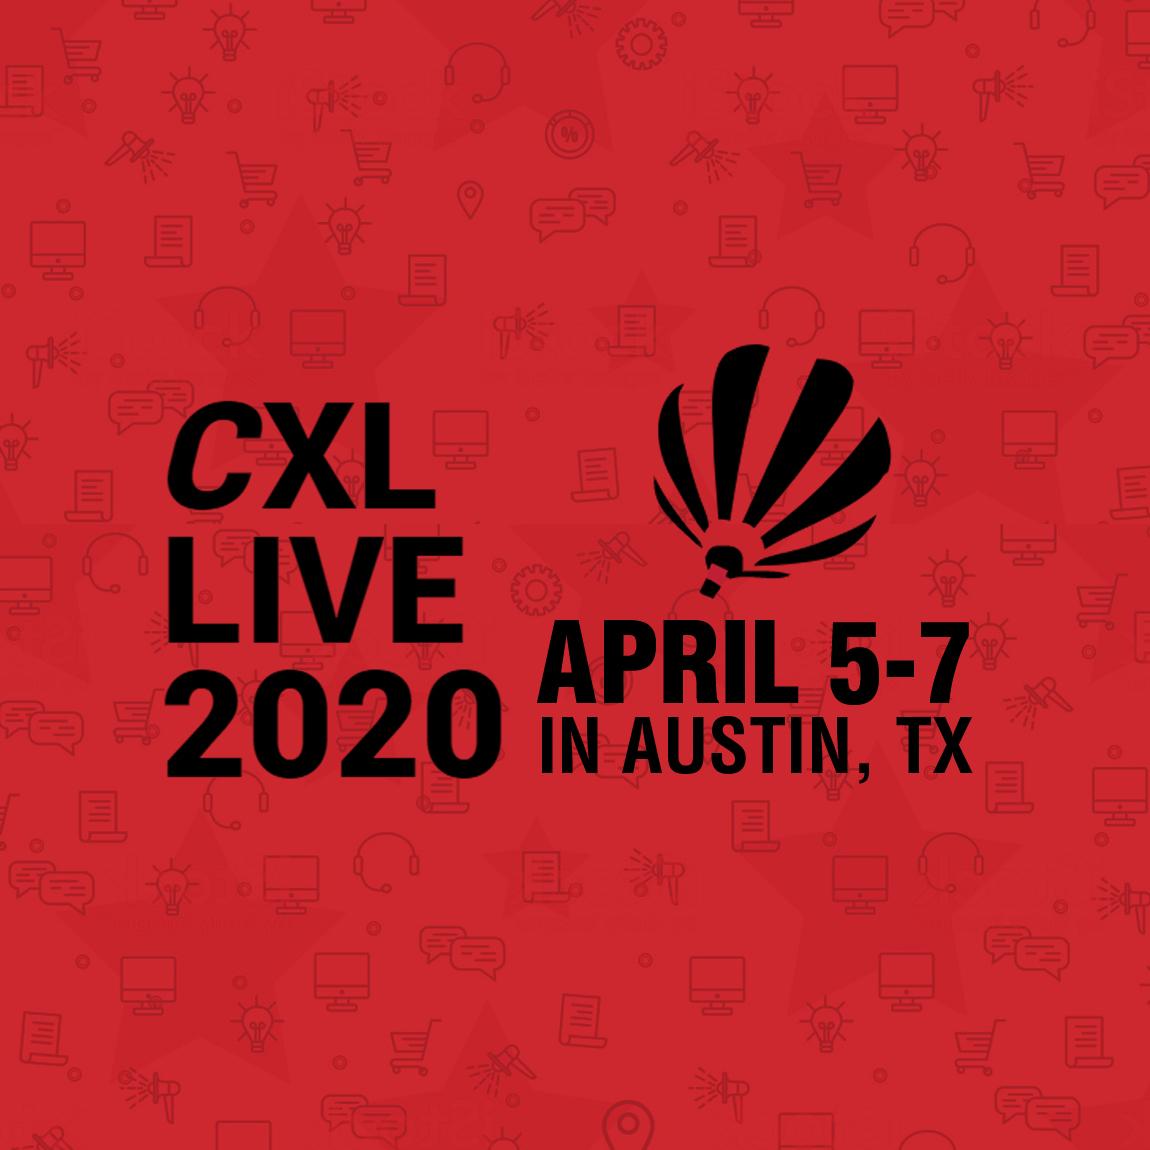 Conversion CXL Live